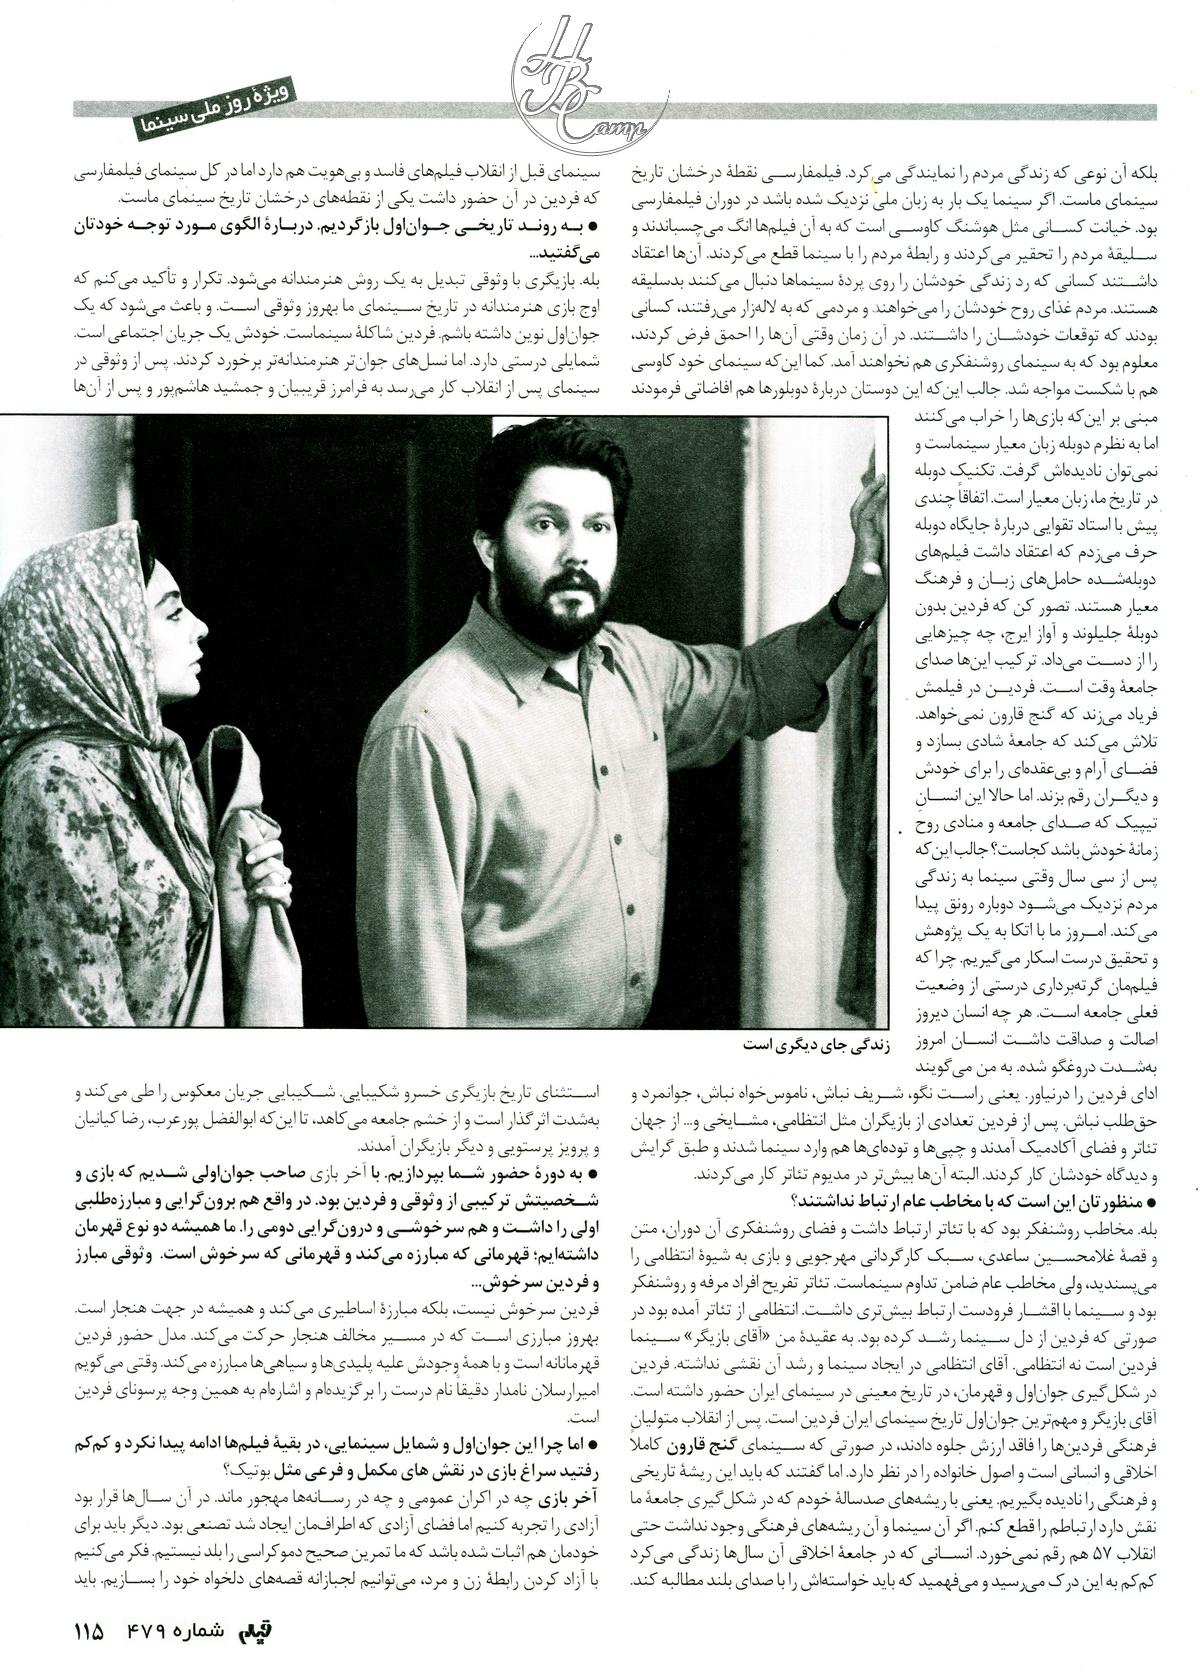 http://yotab.persiangig.com/magazin/film479/002.jpg